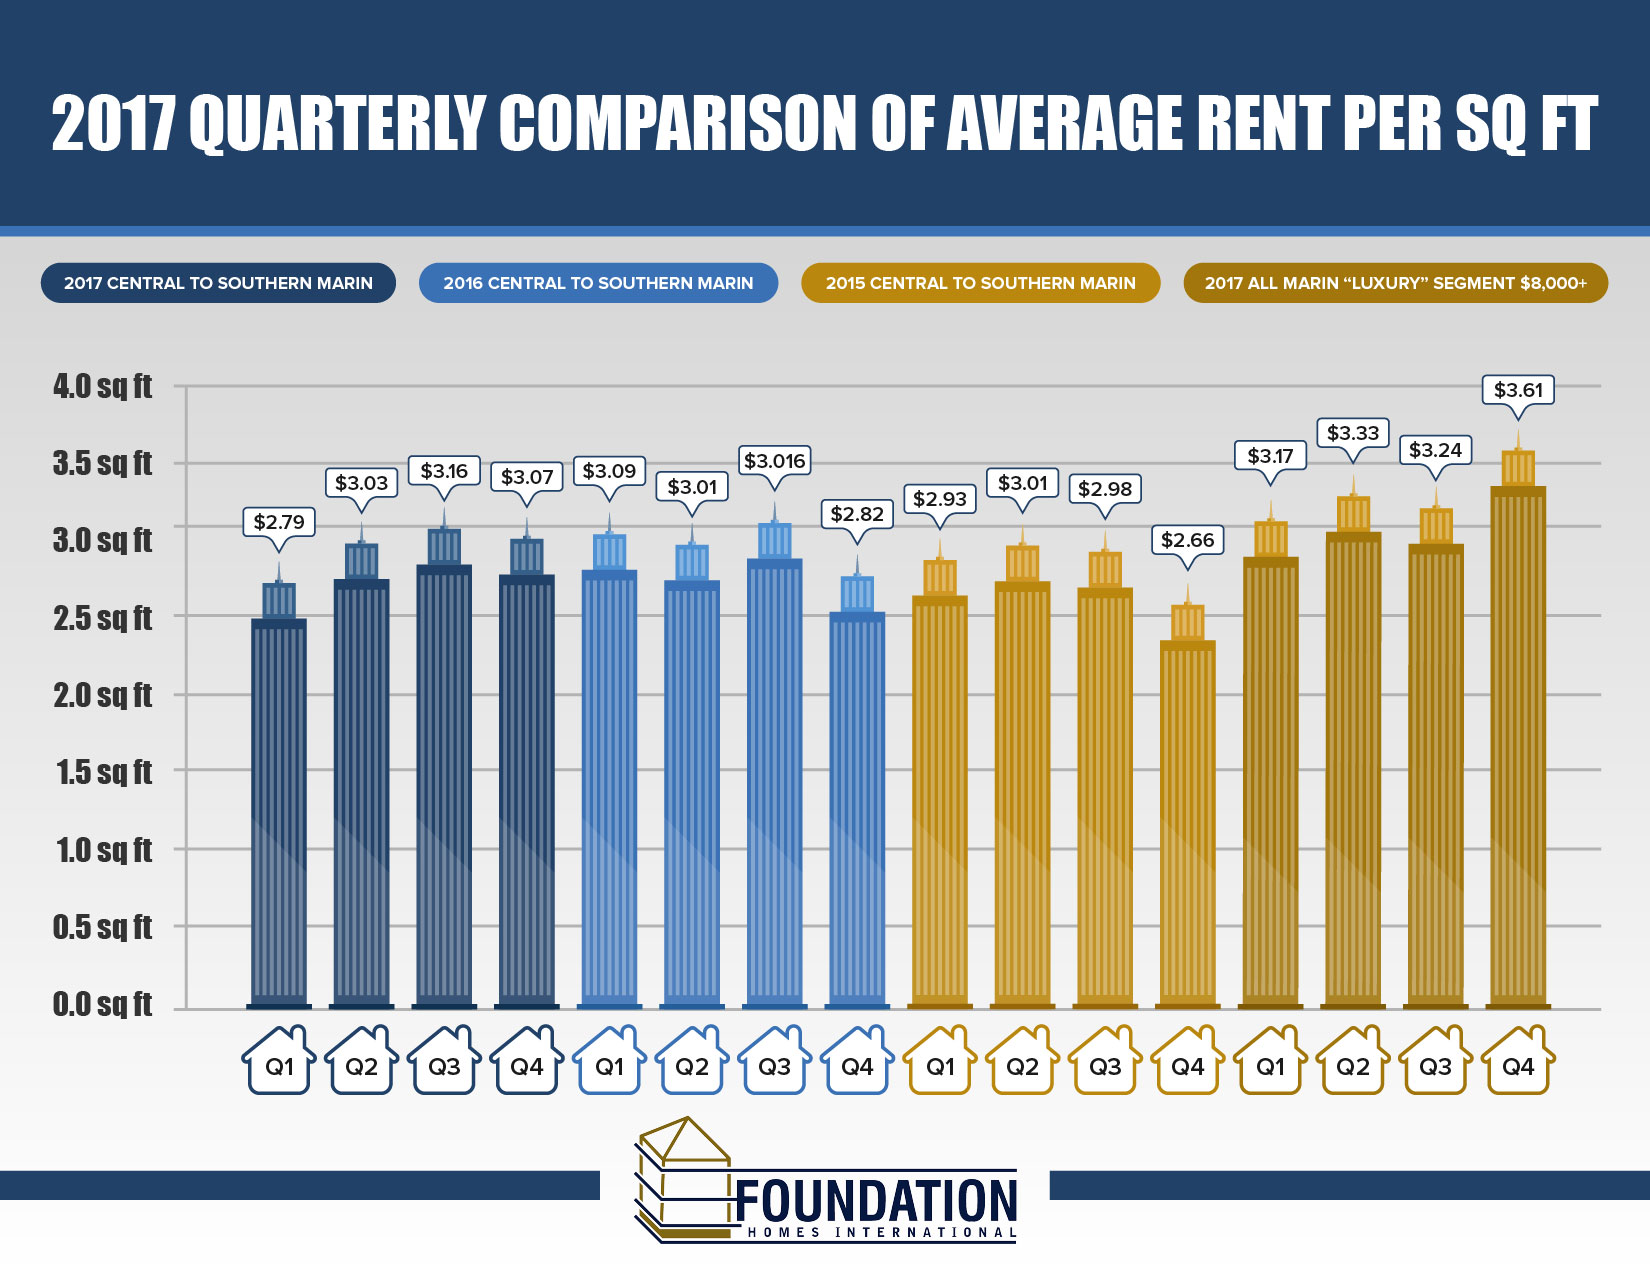 2017 Quarterly Comparison of Average Rent Per Sq Ft